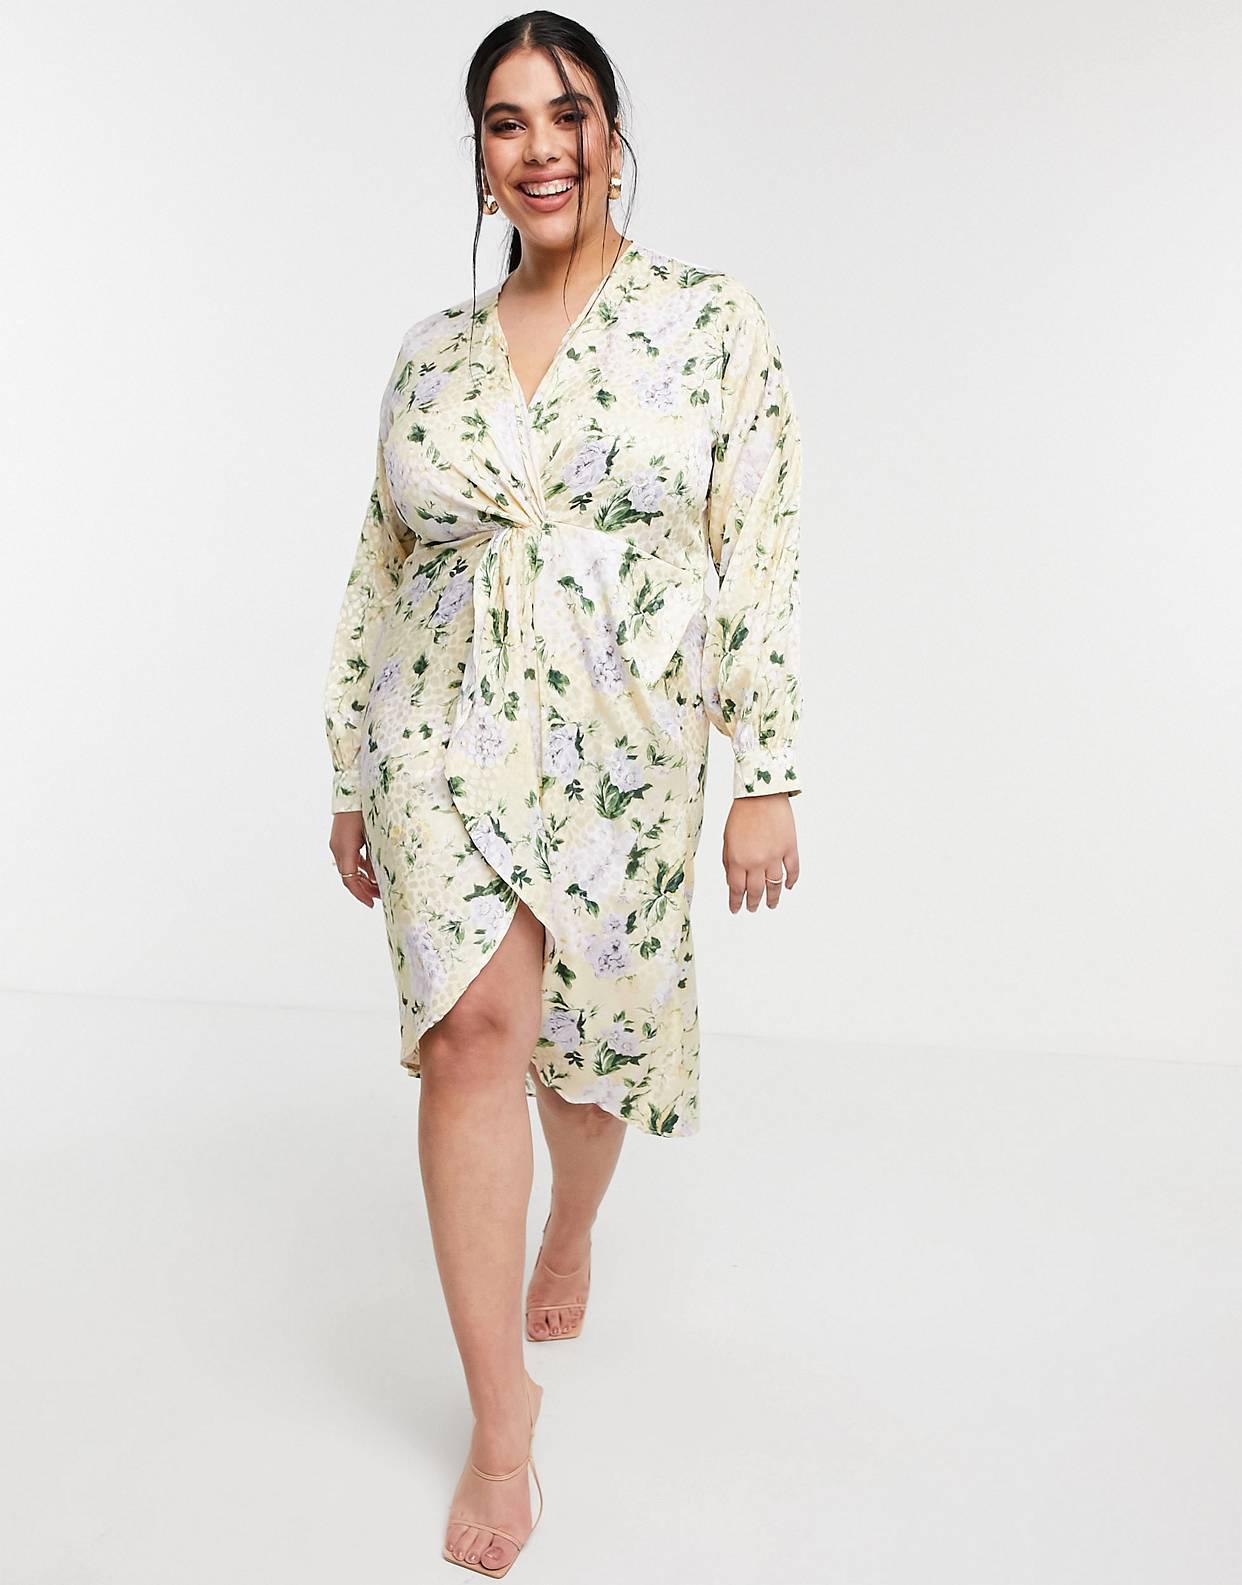 Vestido midi amarillo pastel estilo kimono de manga larga con estampado floral, parte delantera retorcida y bajo asimétrico de Hope & Ivy Plus